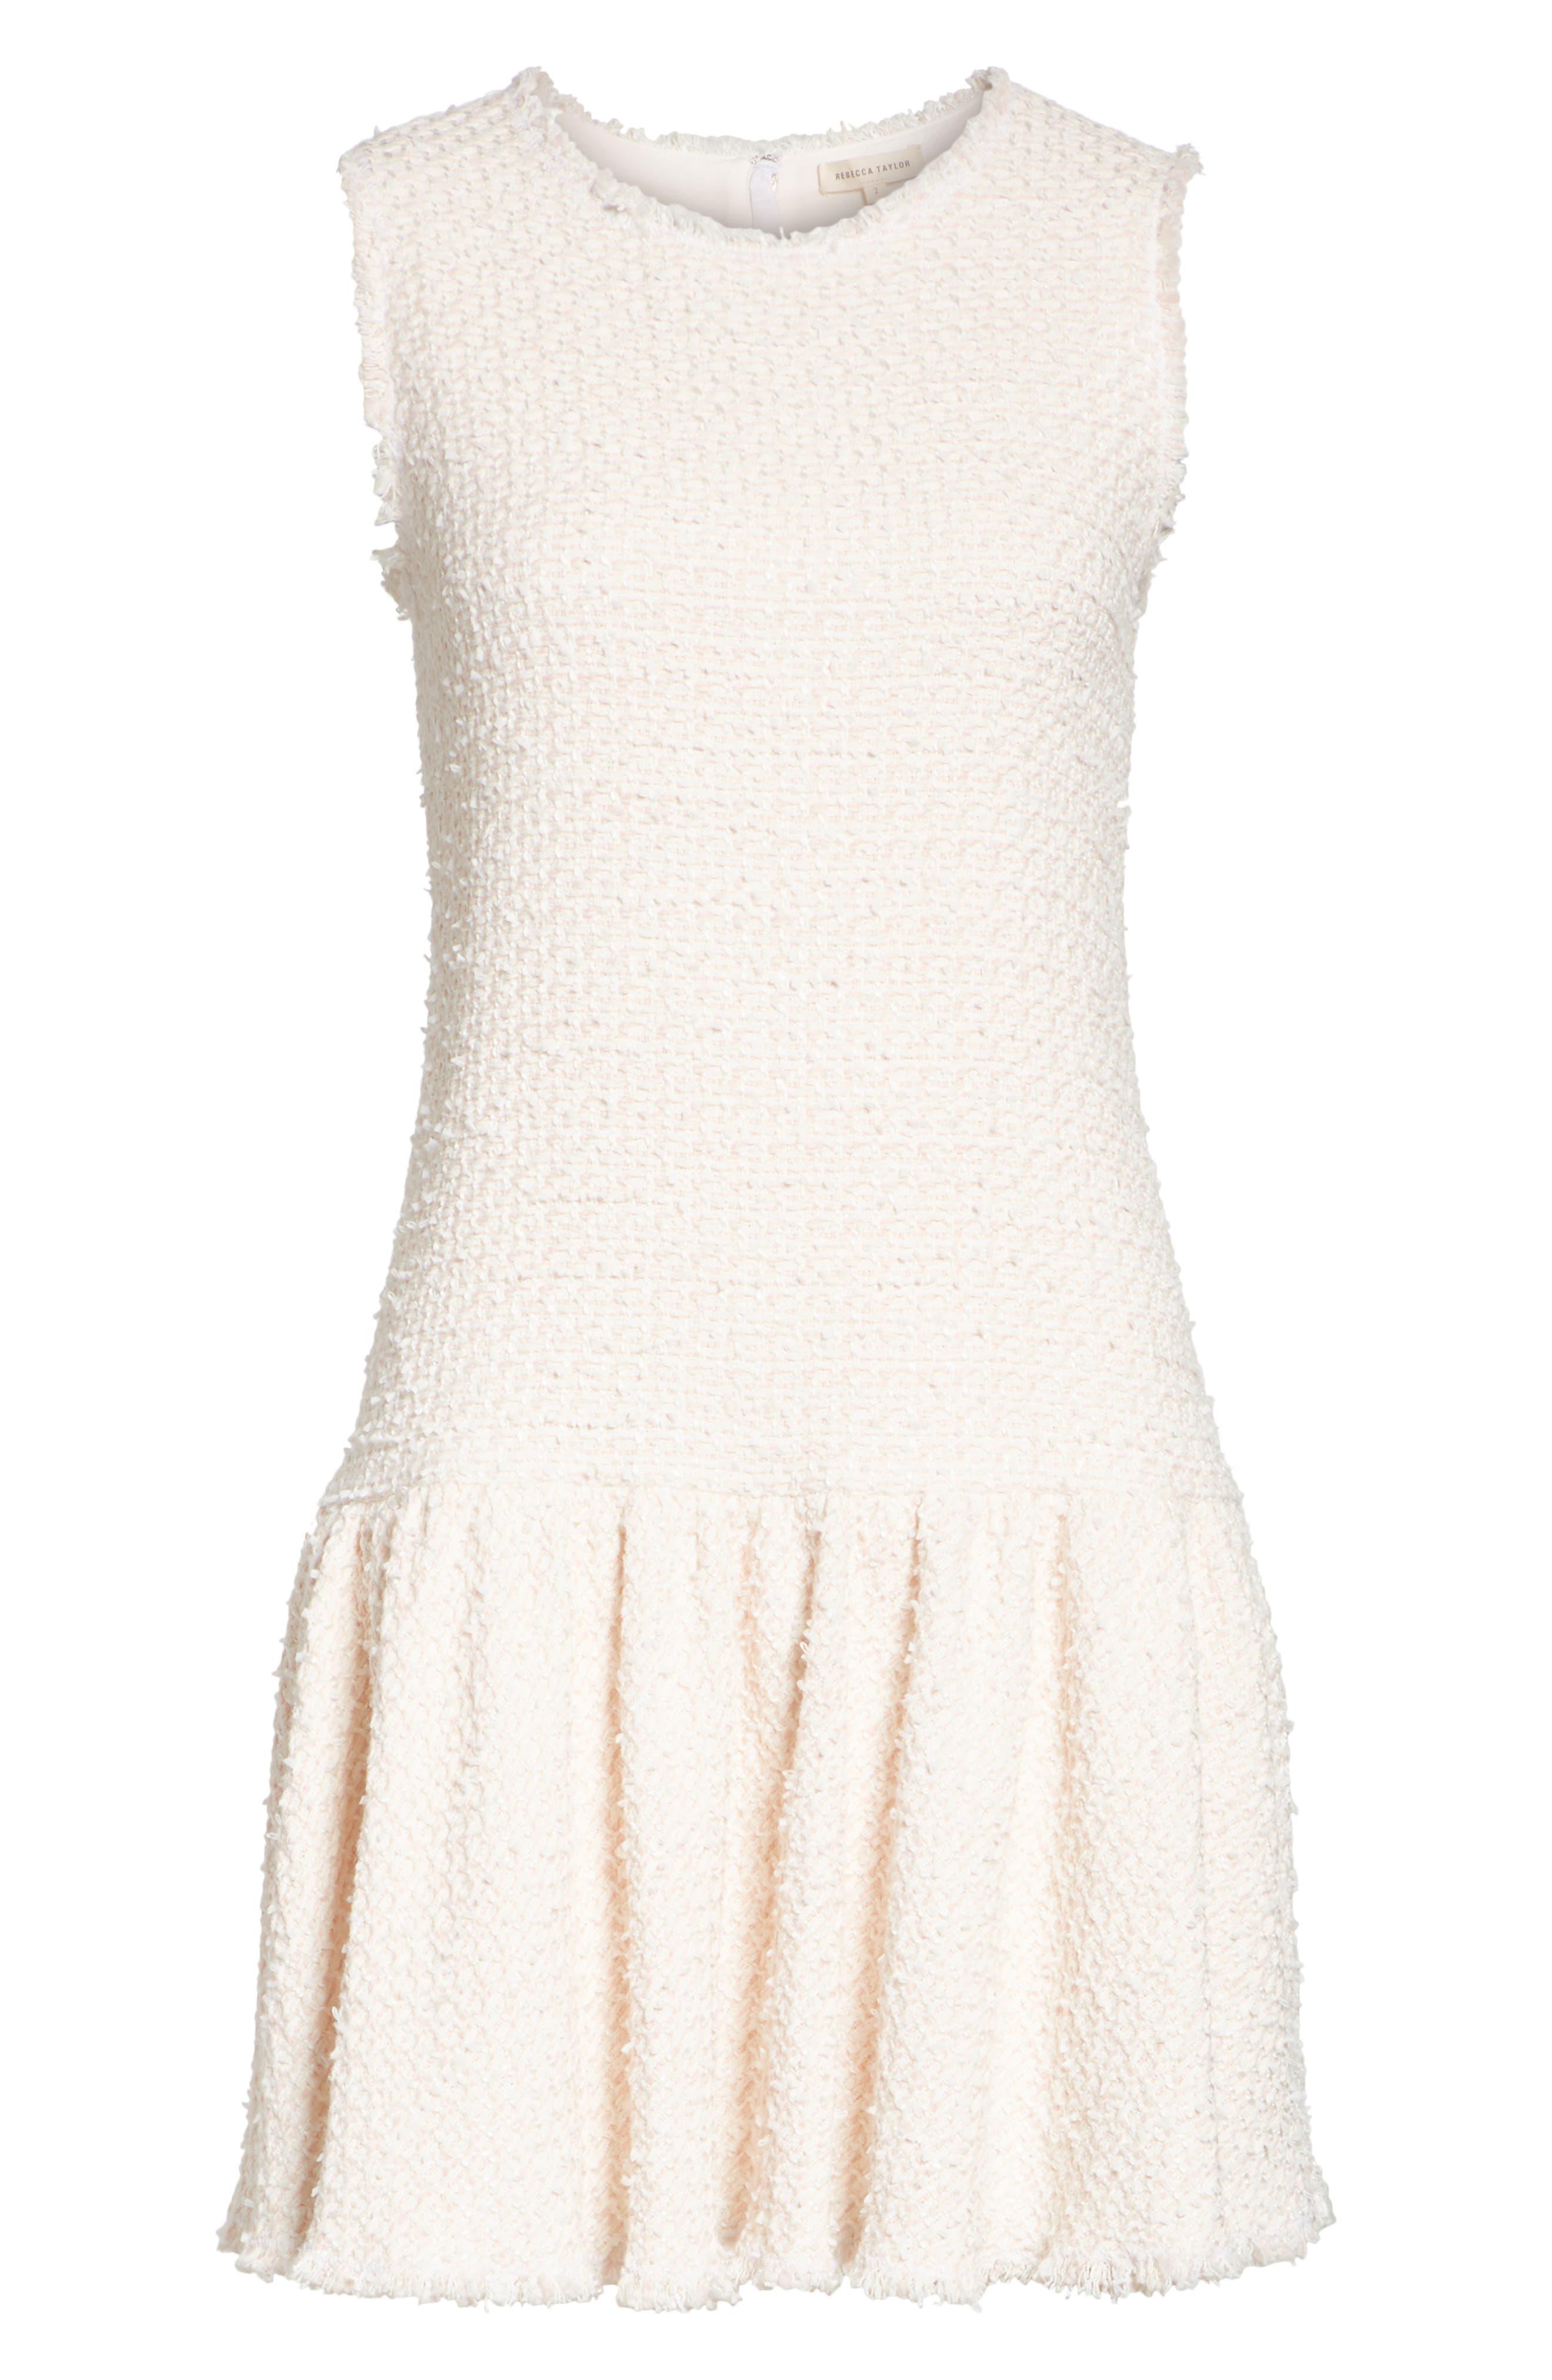 Drop Waist Tweed Dress,                             Alternate thumbnail 6, color,                             Powder Pink